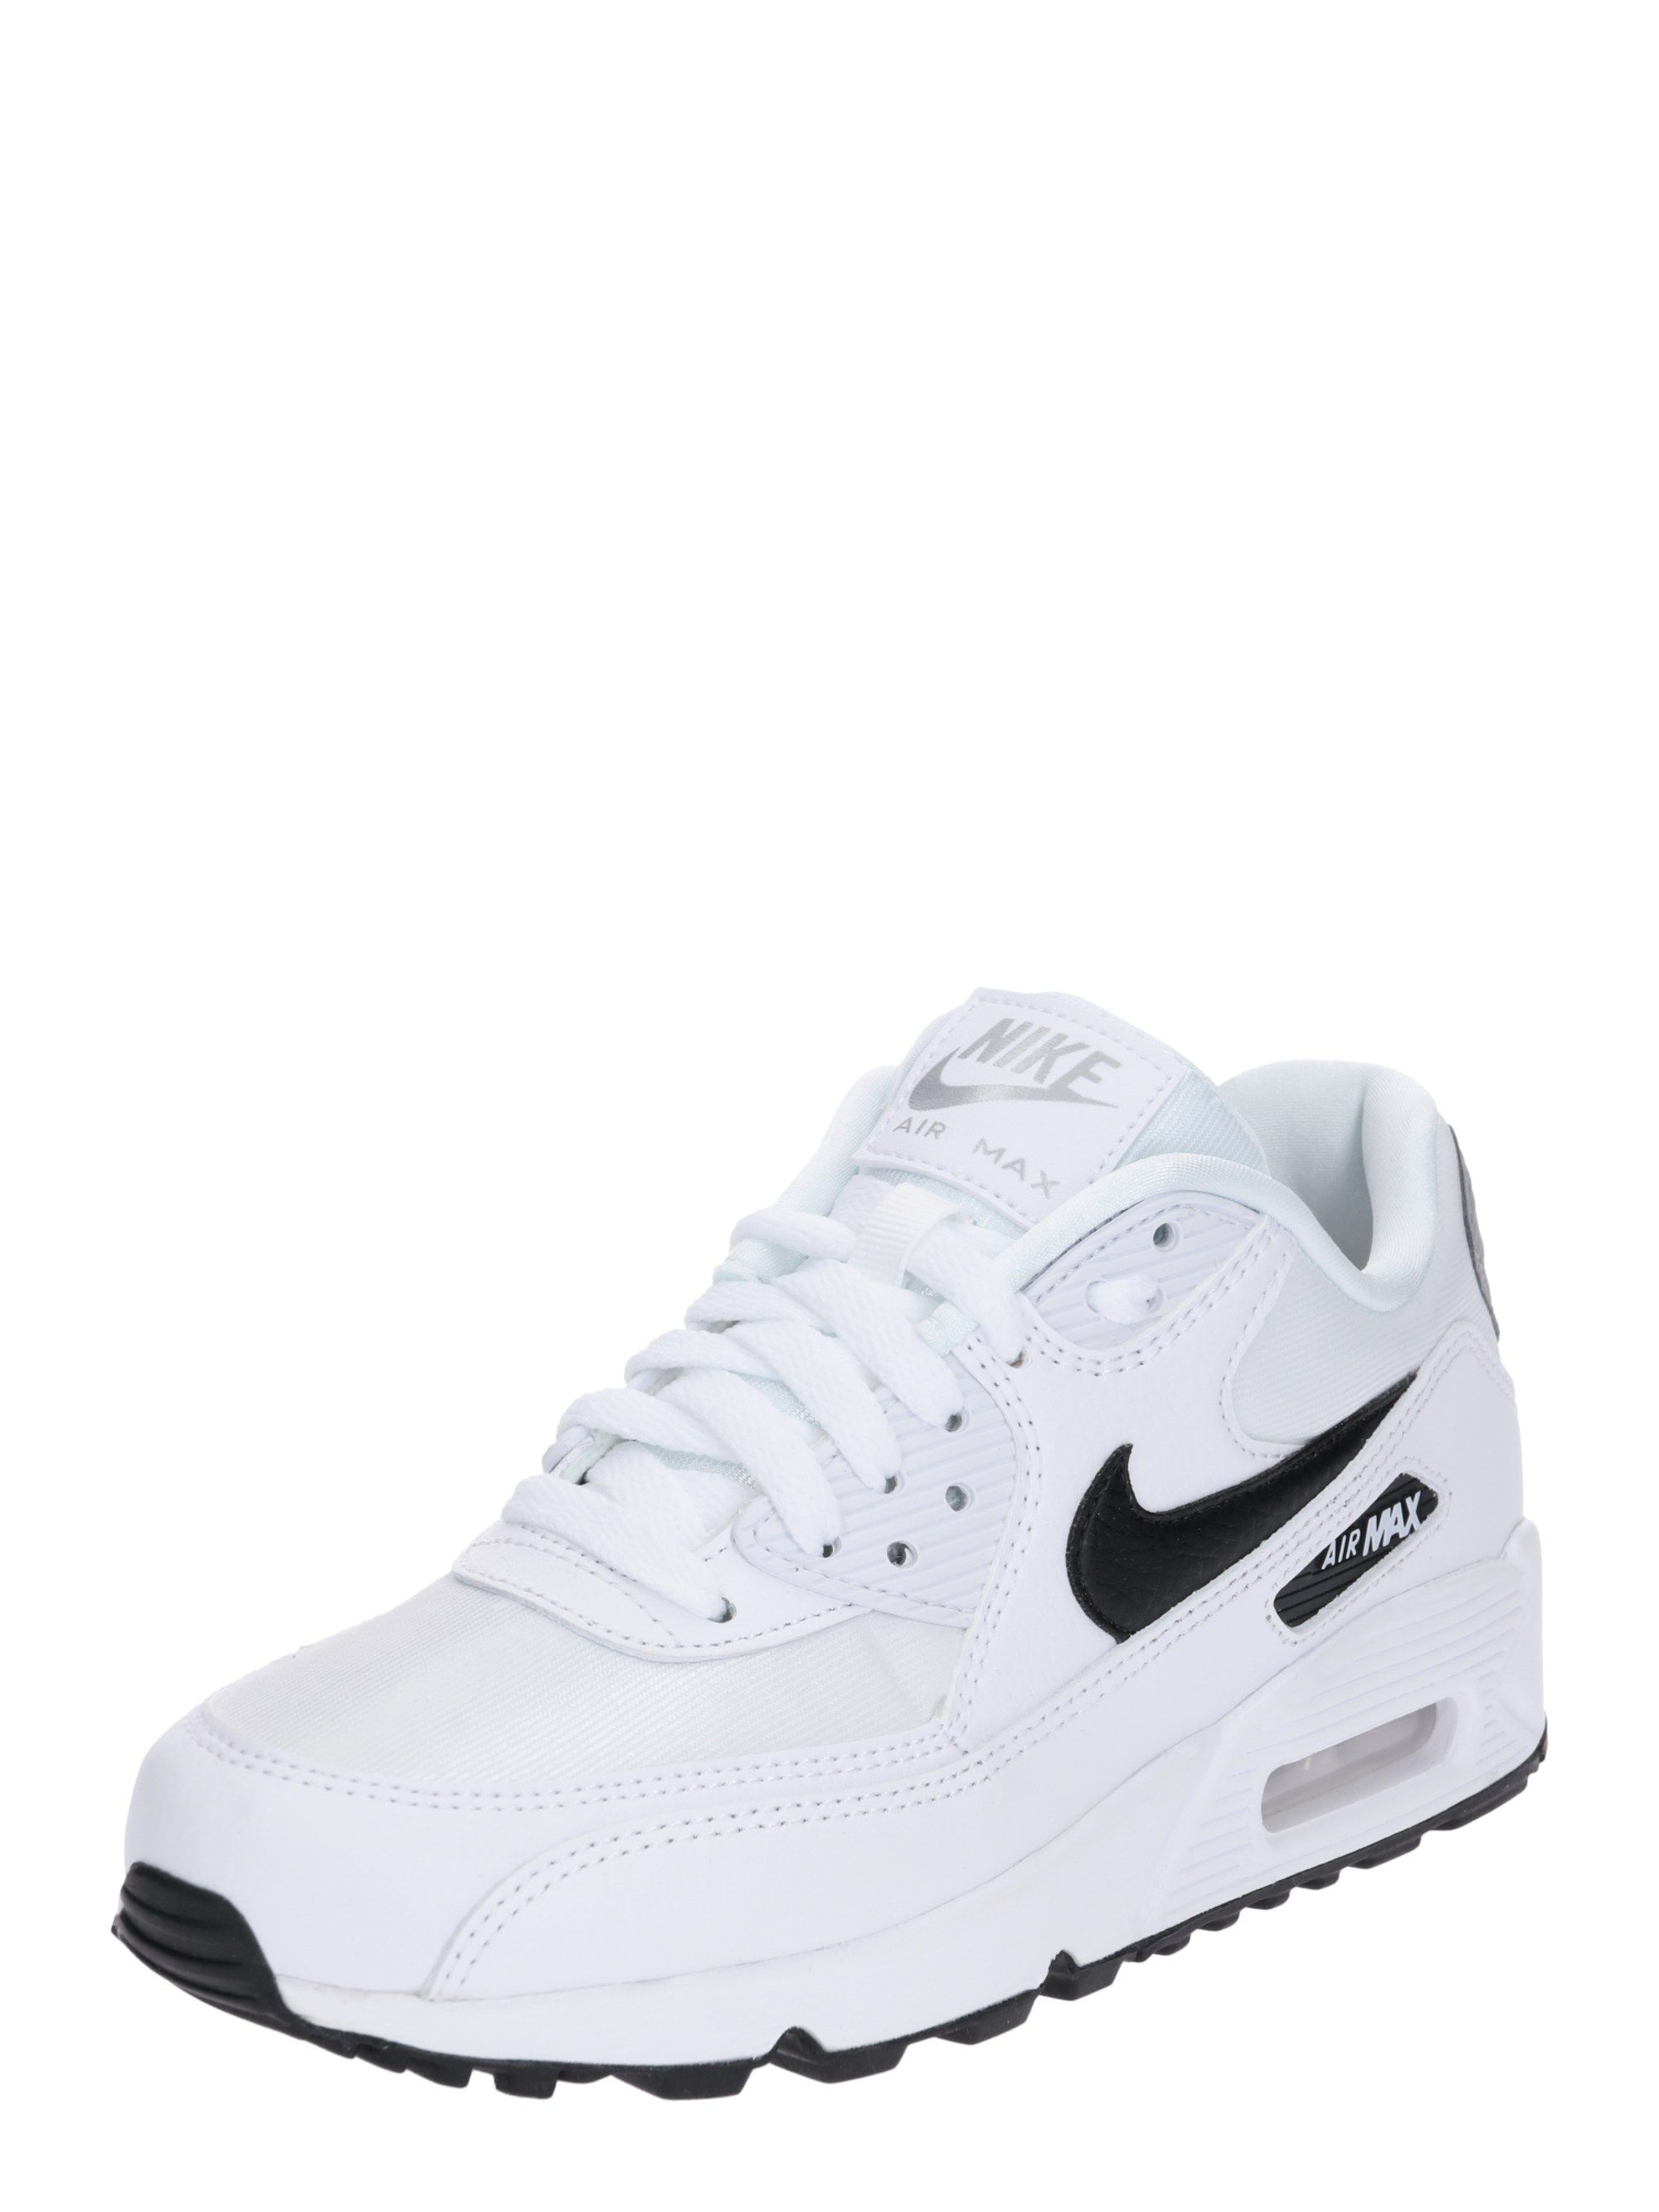 Damen Nike Sportswear Sneaker Air Max 90 braun schwarz weiß